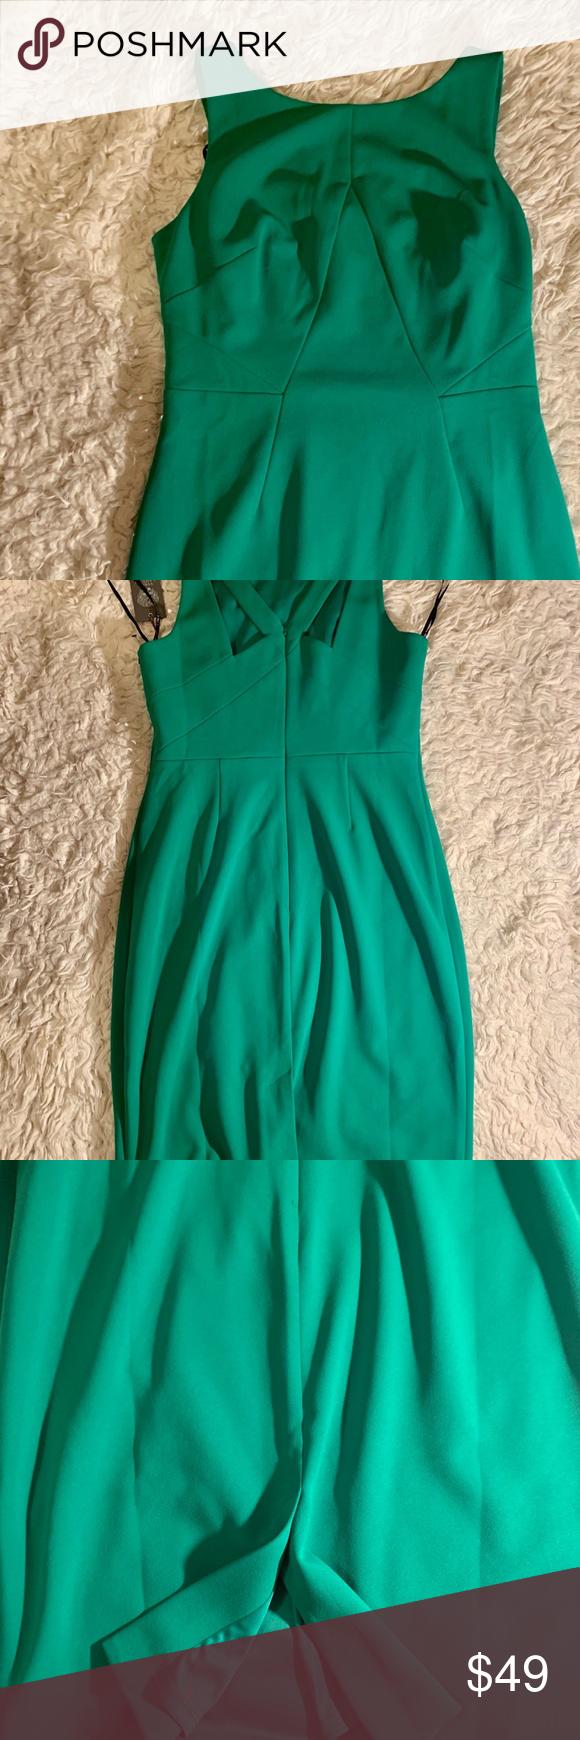 Vince Camuto Green Dress Green Dress Dresses Clothes Design [ 1740 x 580 Pixel ]